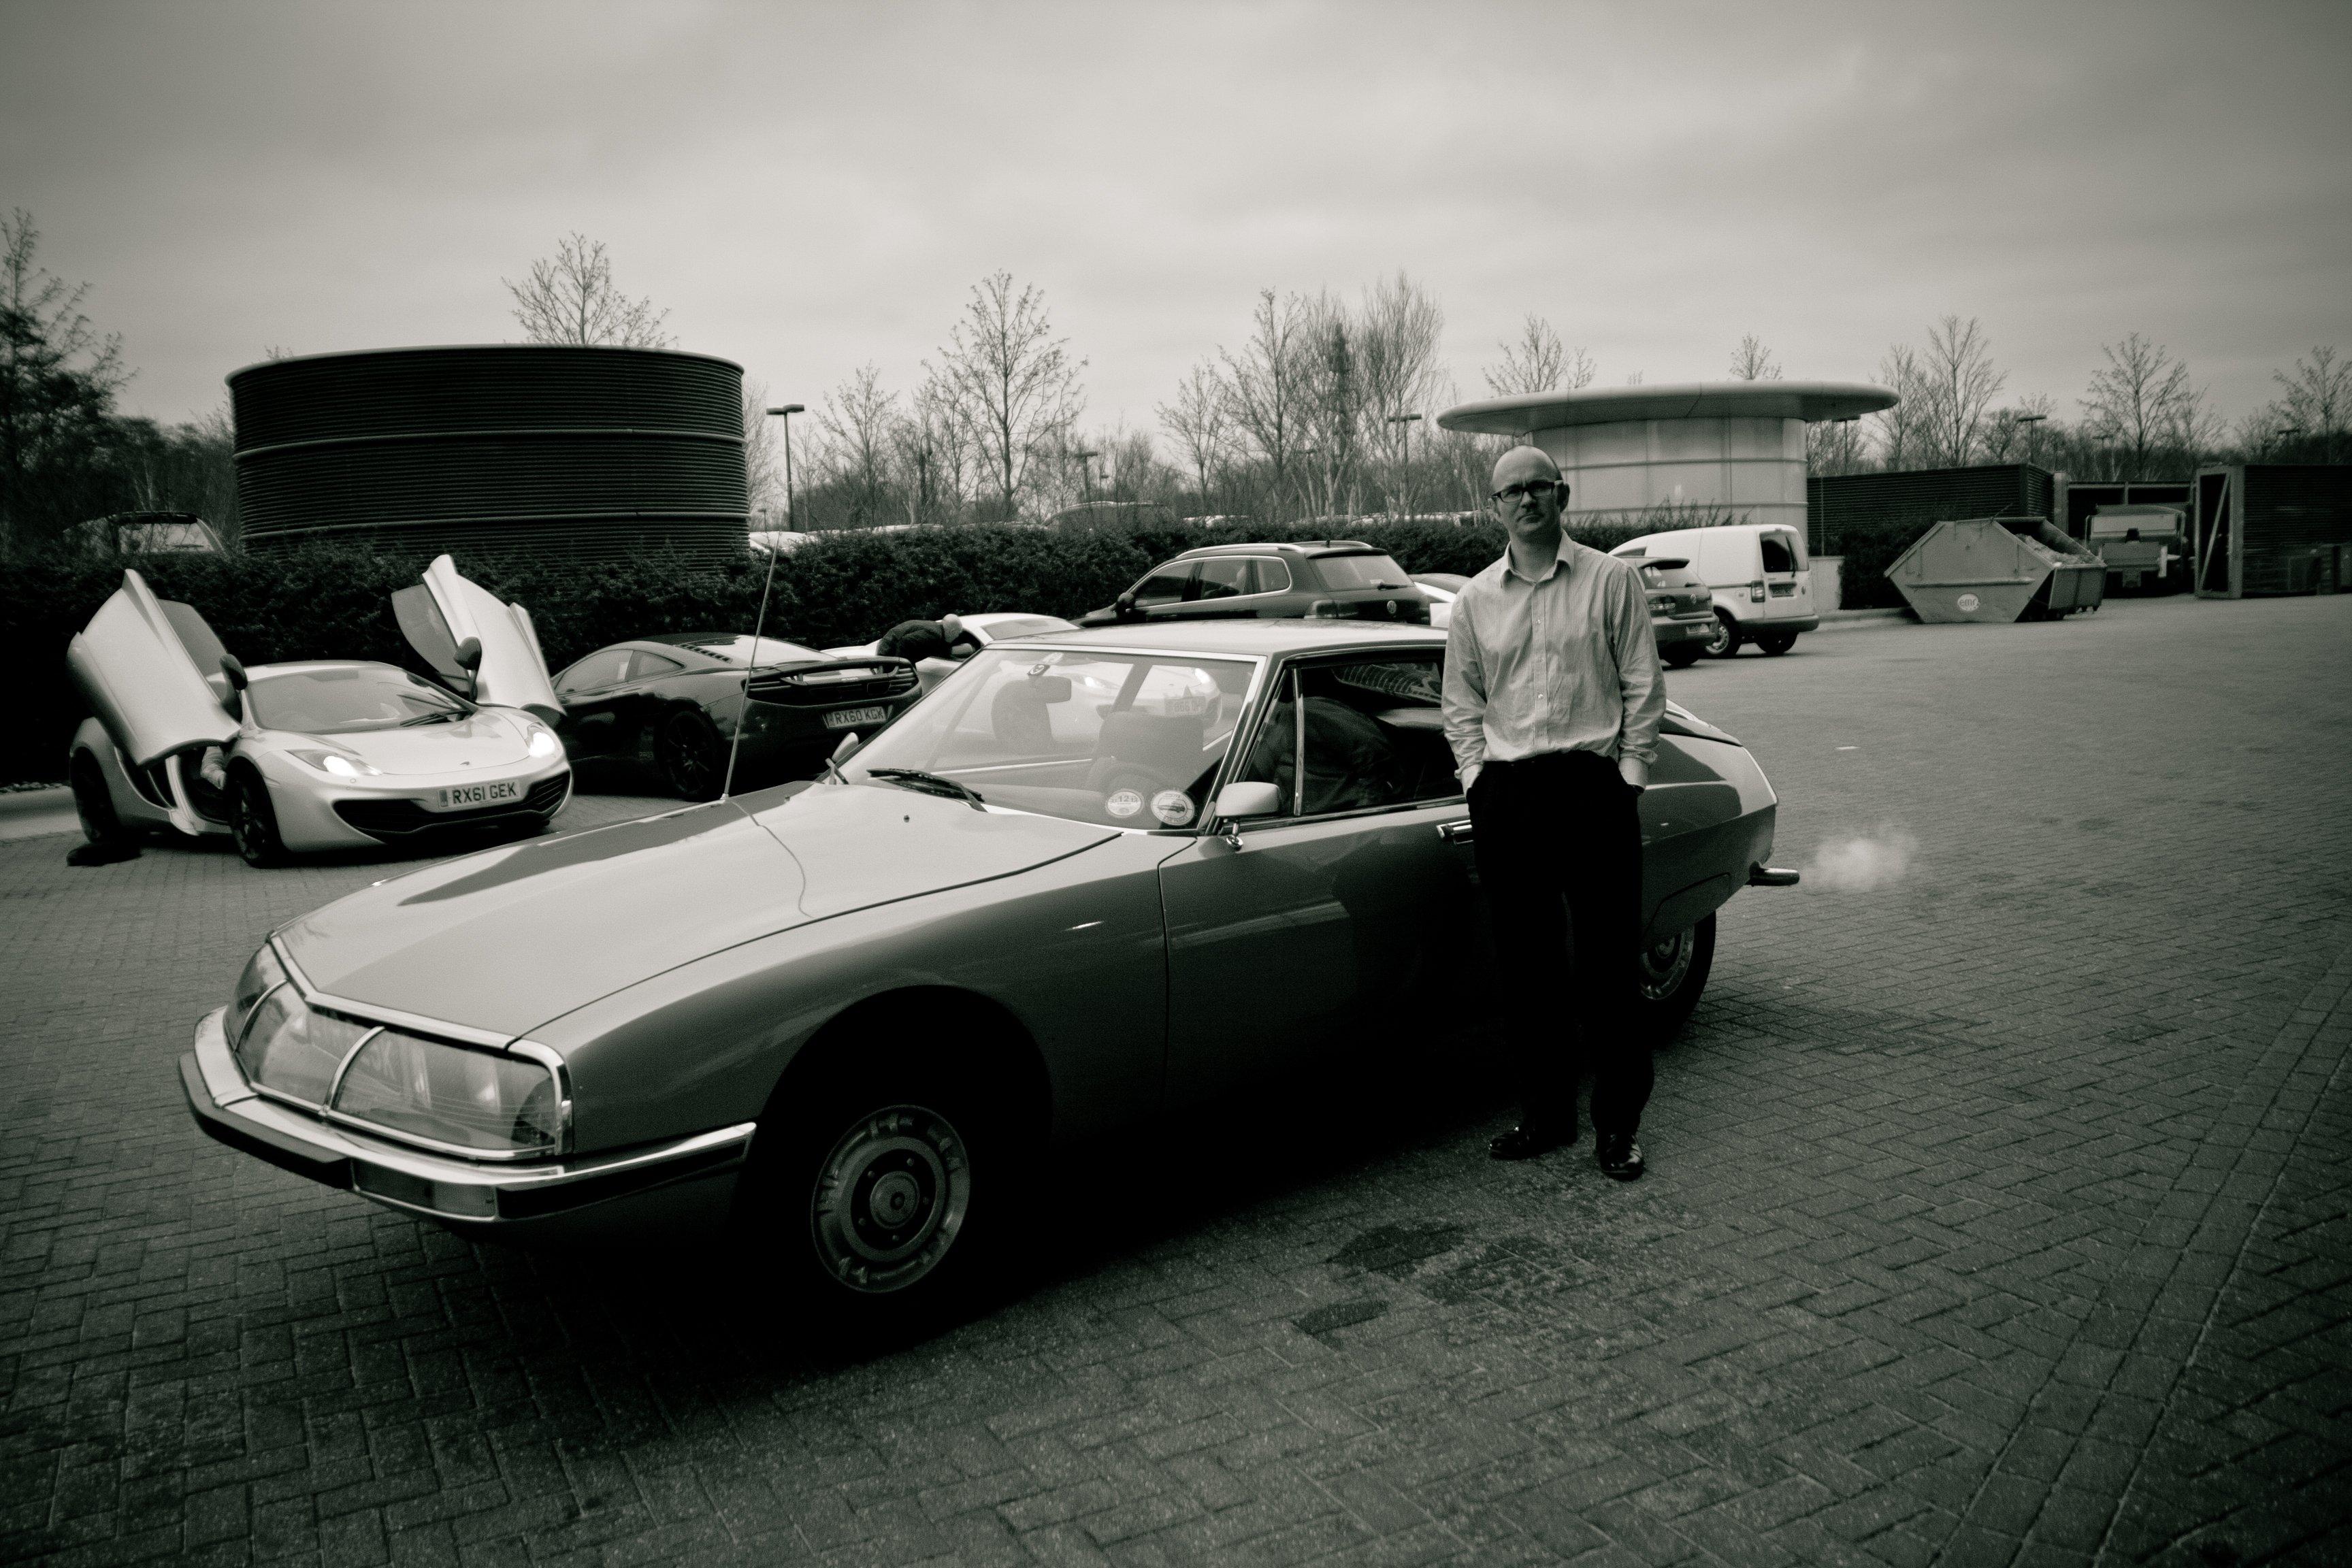 Steve Randle With His 1972 Citroen SM. Image: Steve Randle